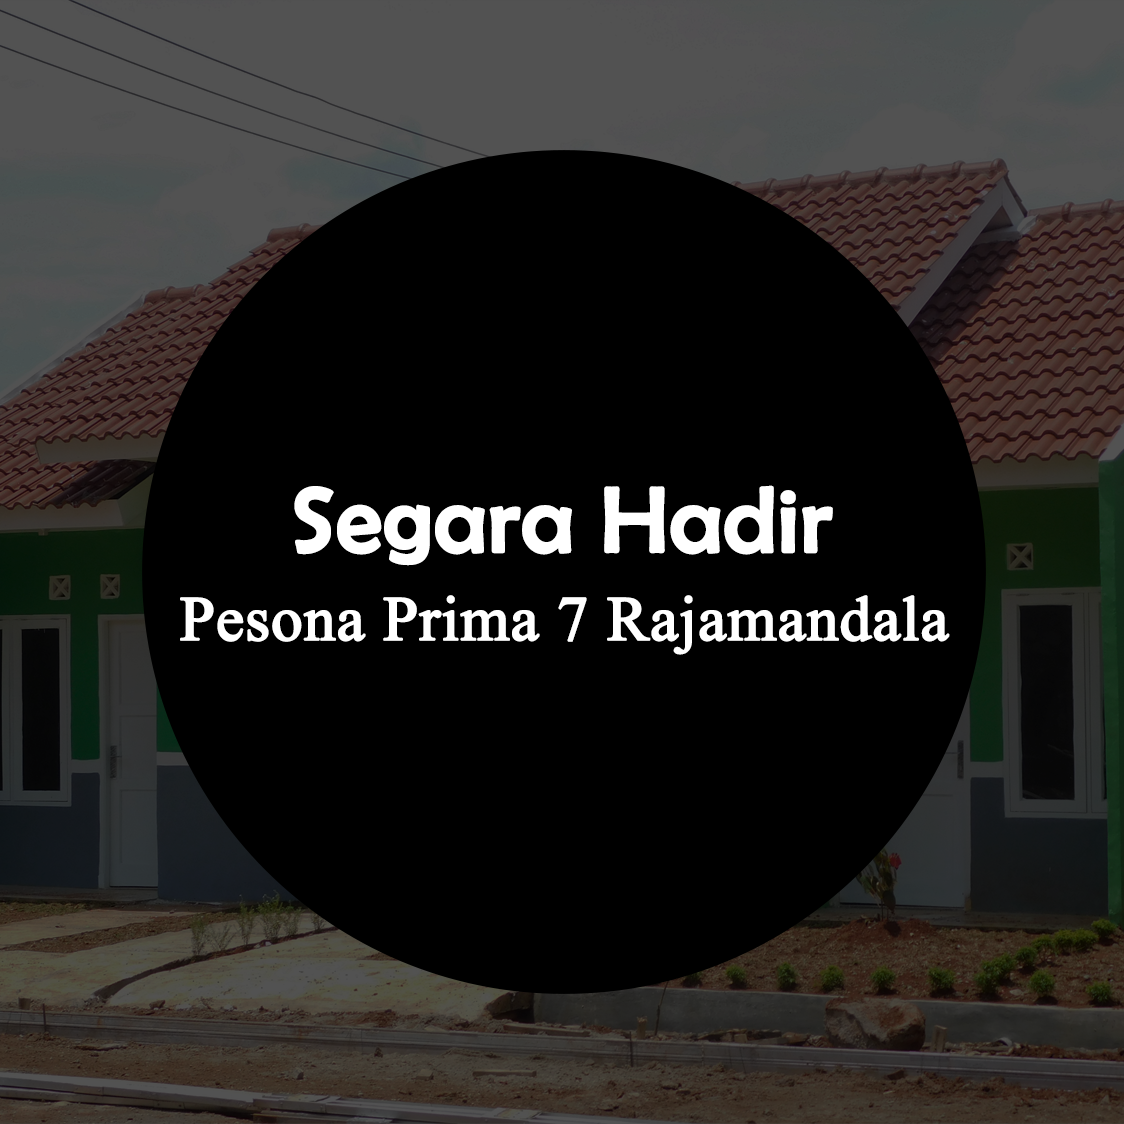 Pesona Prima 7 Rajamandala Kabupaten Bandung Barat